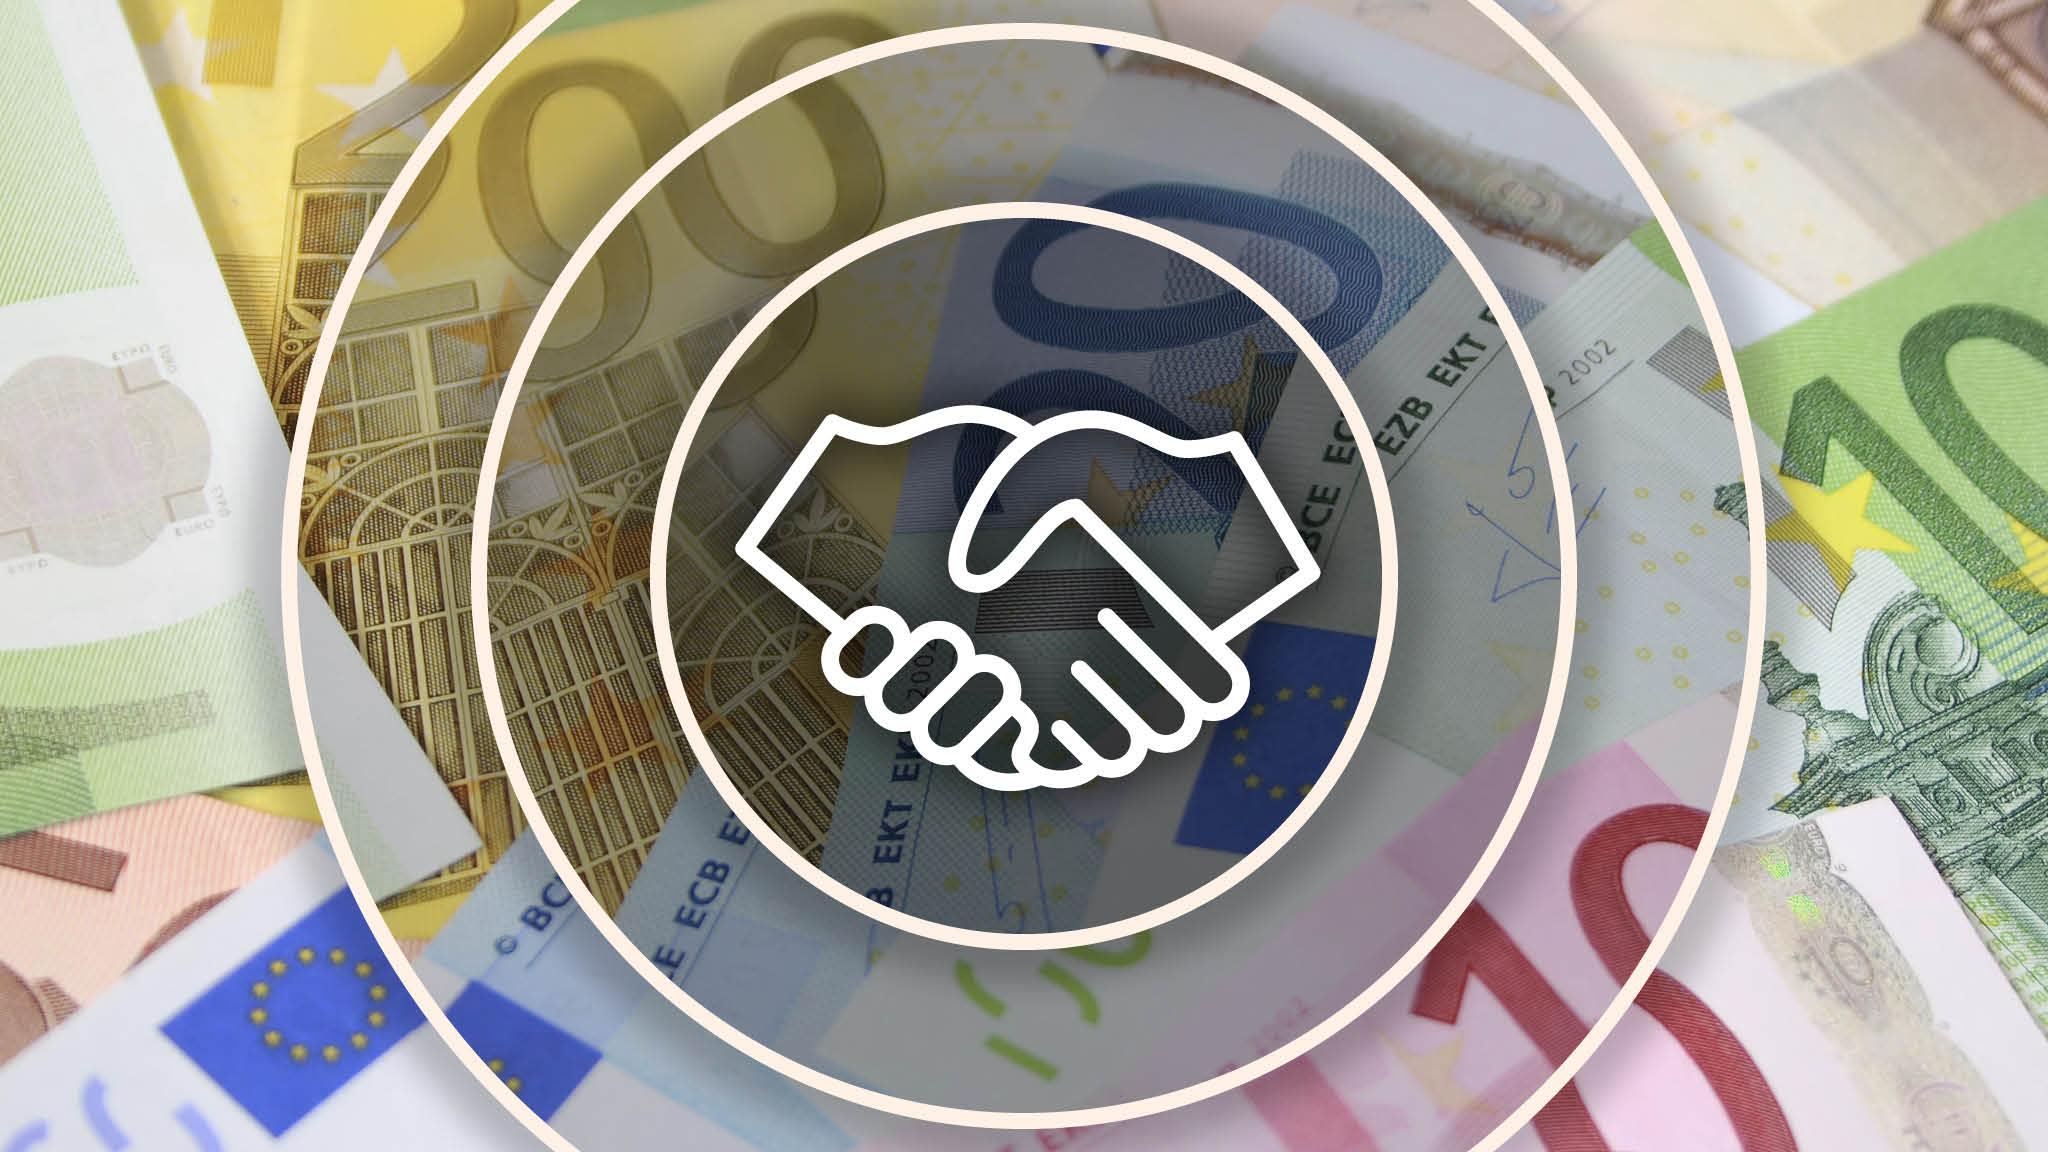 Tensions over junk bond covenants start to boil over